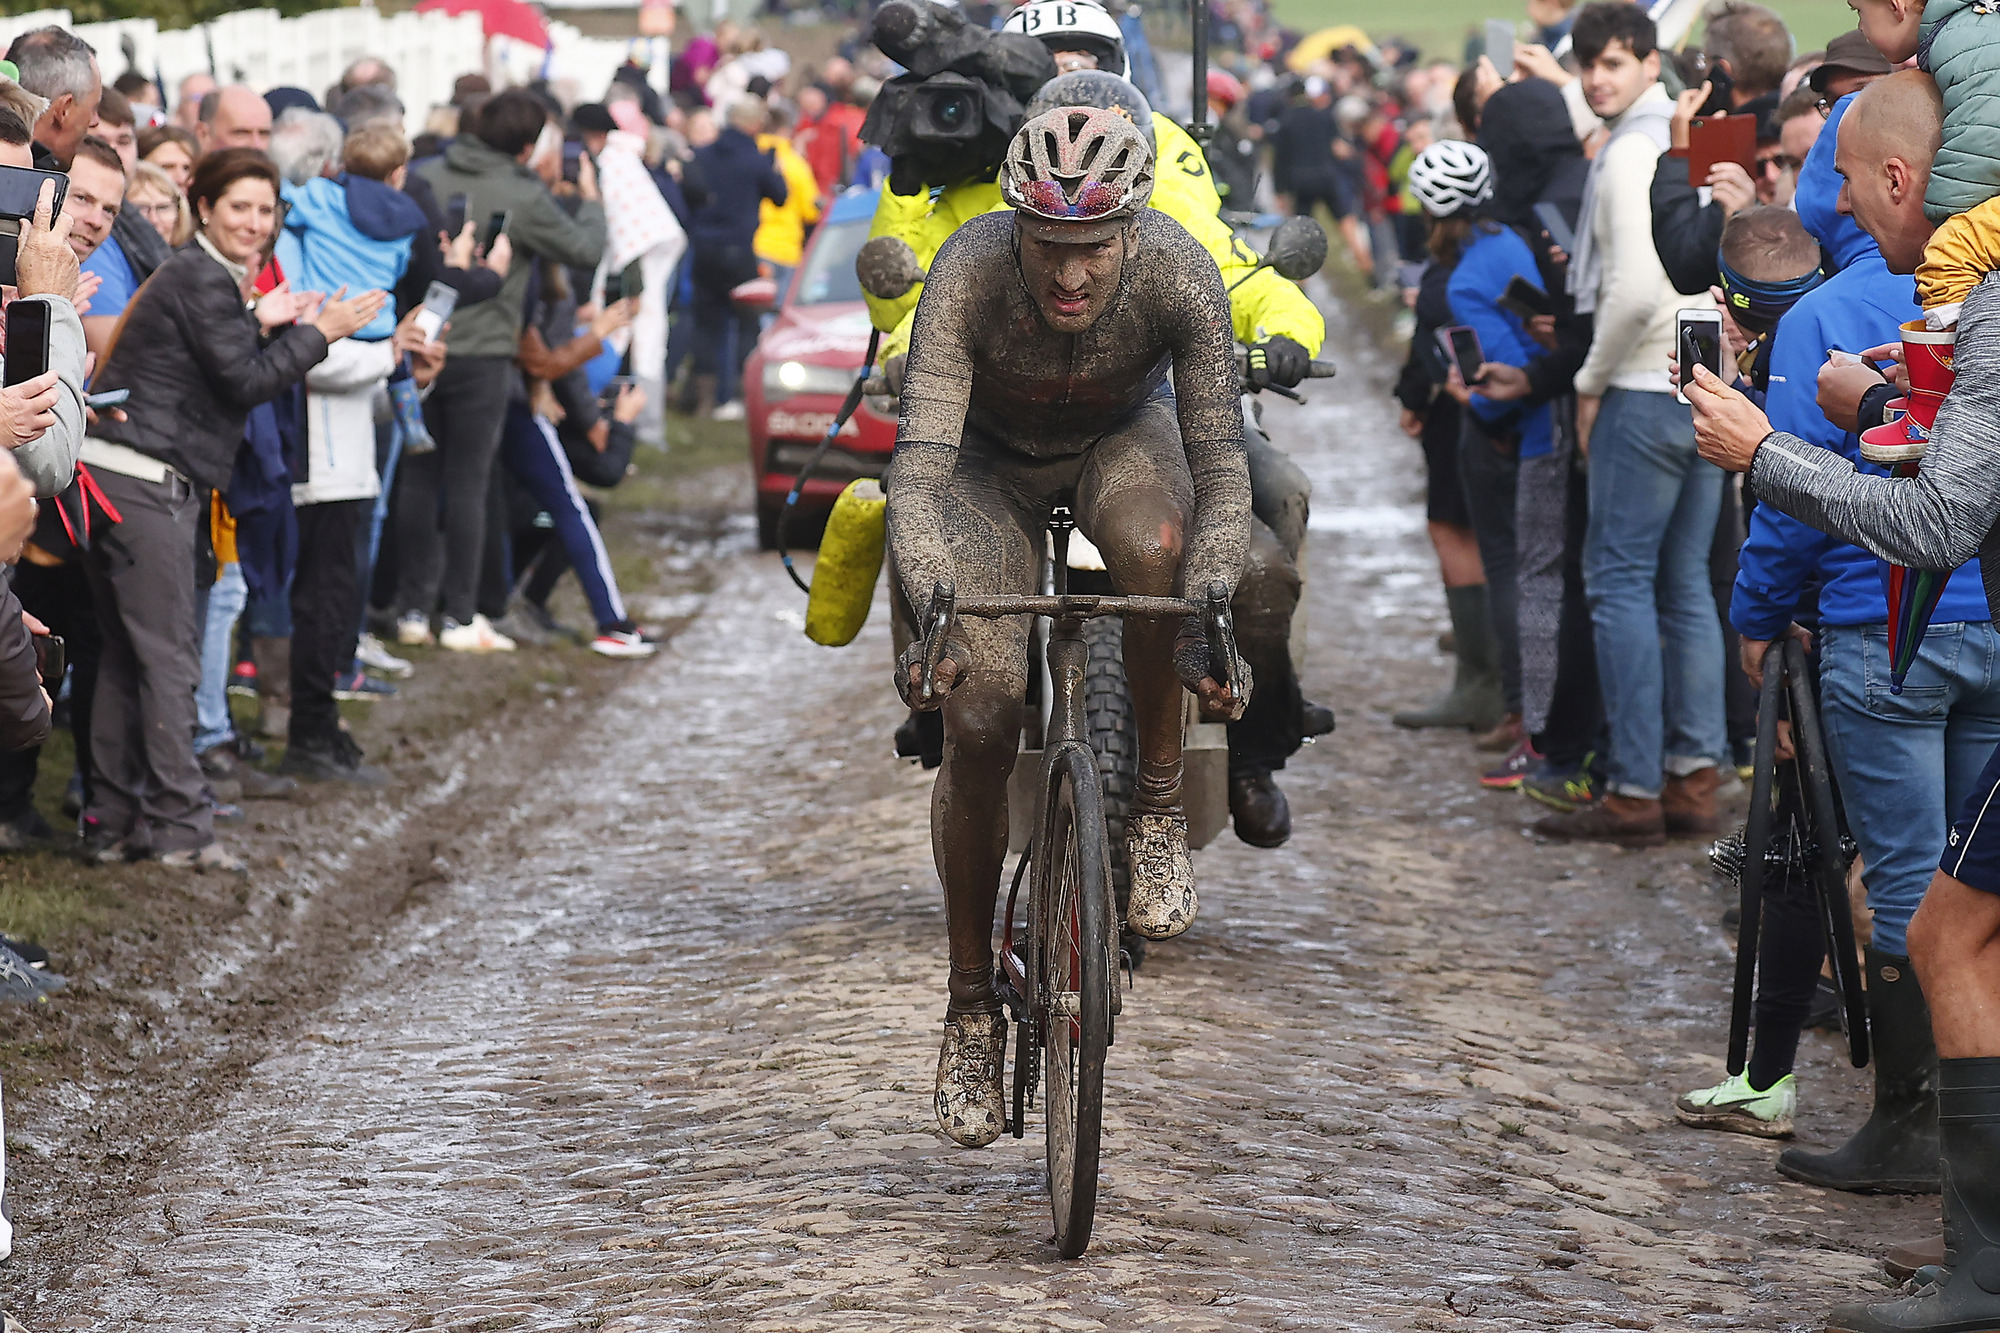 Paris Roubaix 2021 118th Edition Denain Roubaix 2577 km 03102021 Gianni Moscon ITA Ineos Grenadiers photo Luca BettiniBettiniPhoto2021